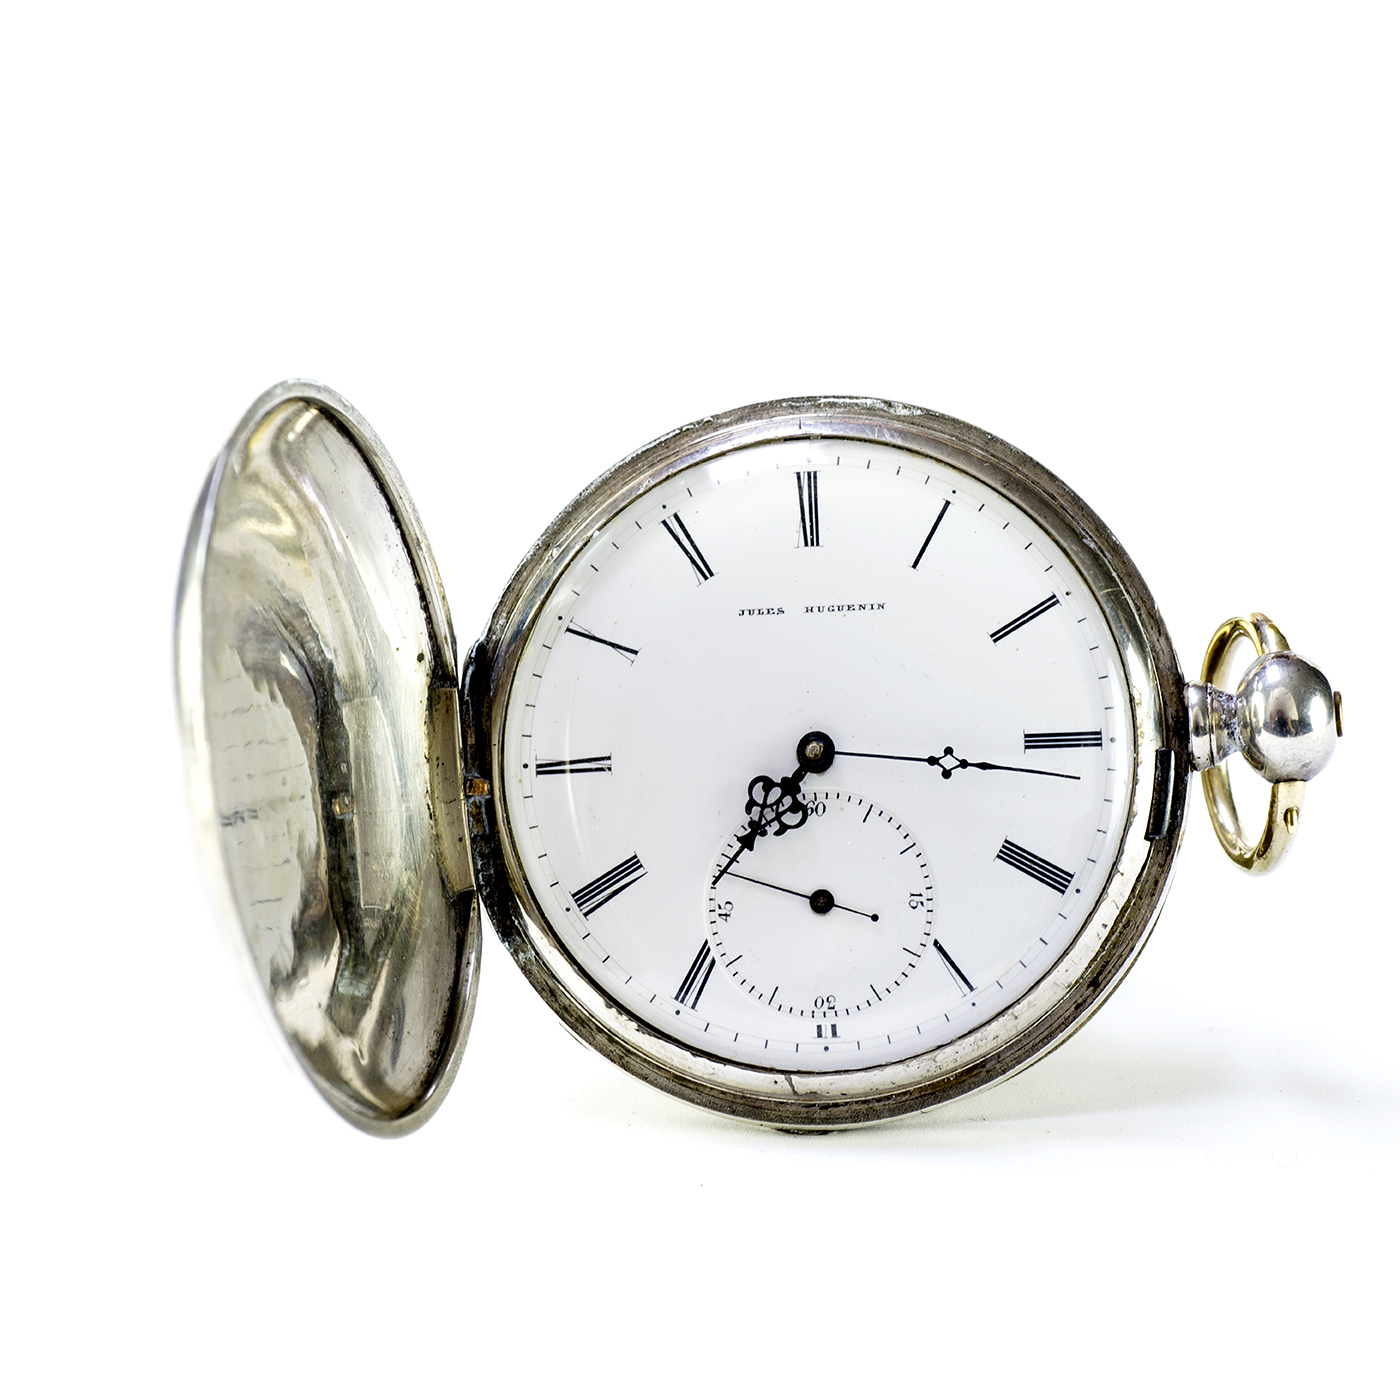 JULES HUGUENIN. Reloj de bolsillo, saboneta. Locle, Suiza, ca. 1840.